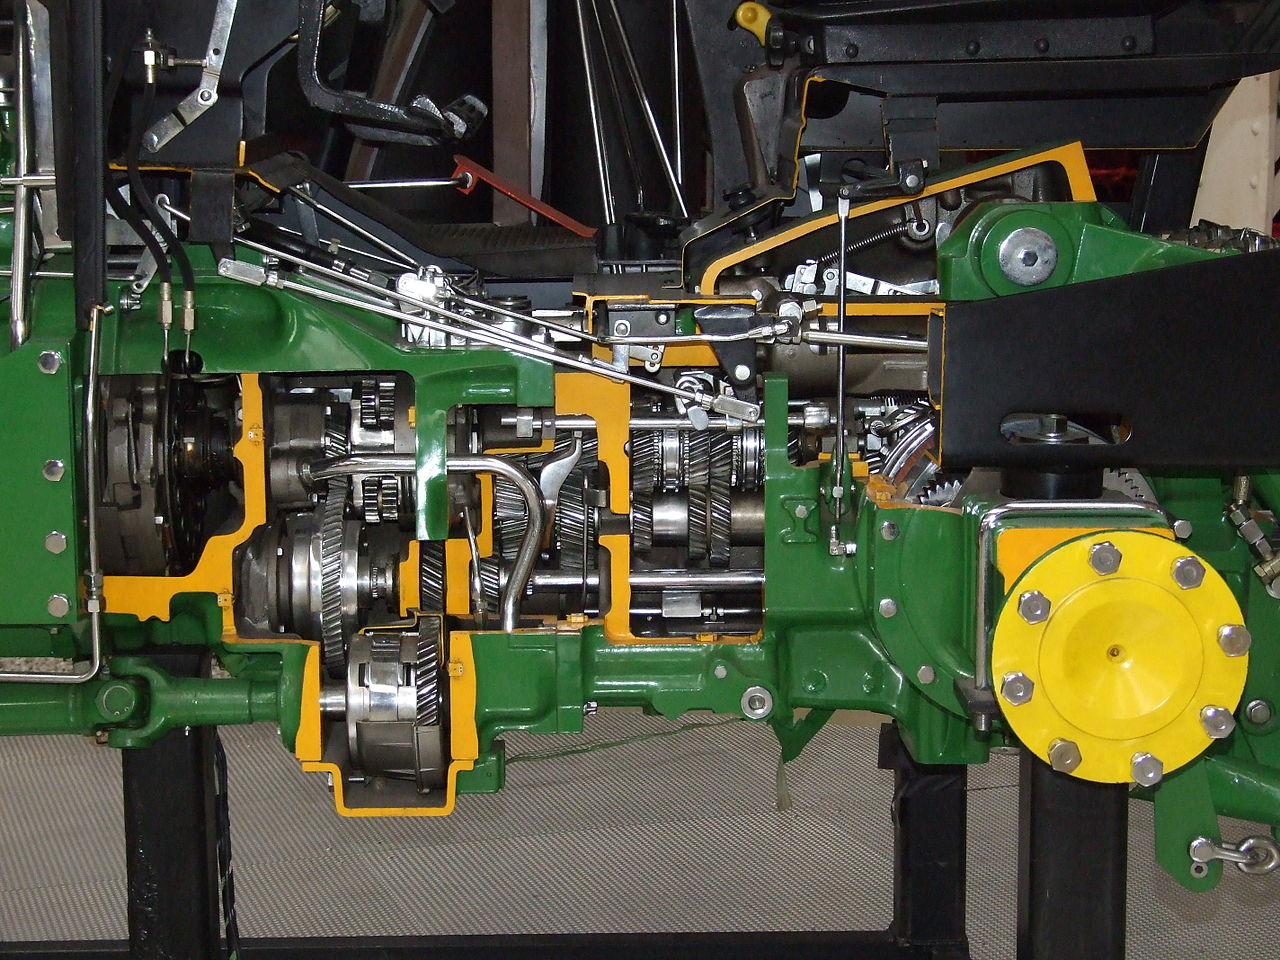 John Deere 600 Transmission Amt Wiring Diagram Tractorhousecom For Sale 2 Listings